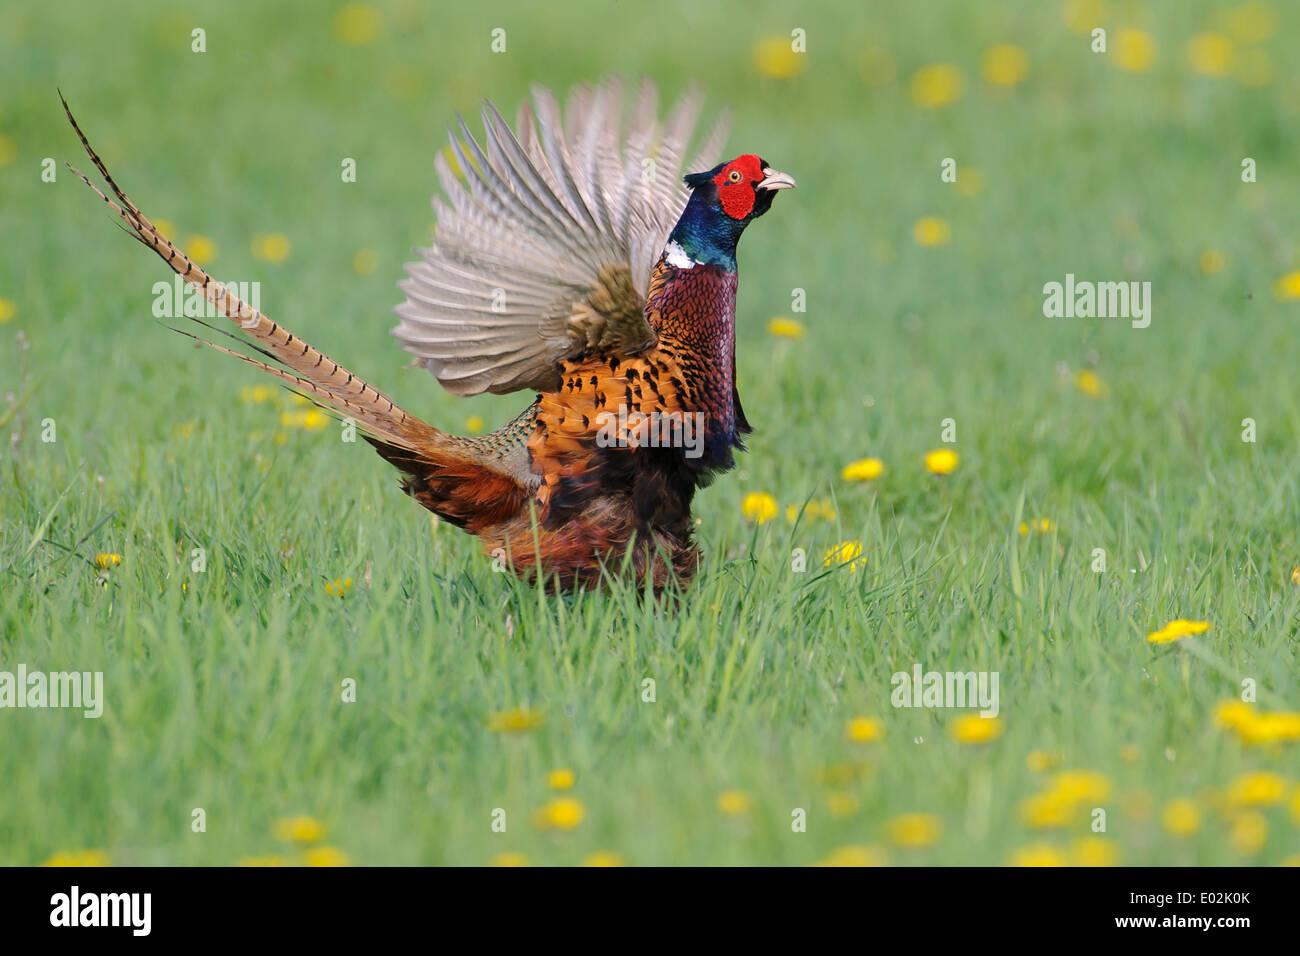 mating call, common pheasant, phasianus colchicus, vechta, niedersachsen, lower saxony, germany - Stock Image